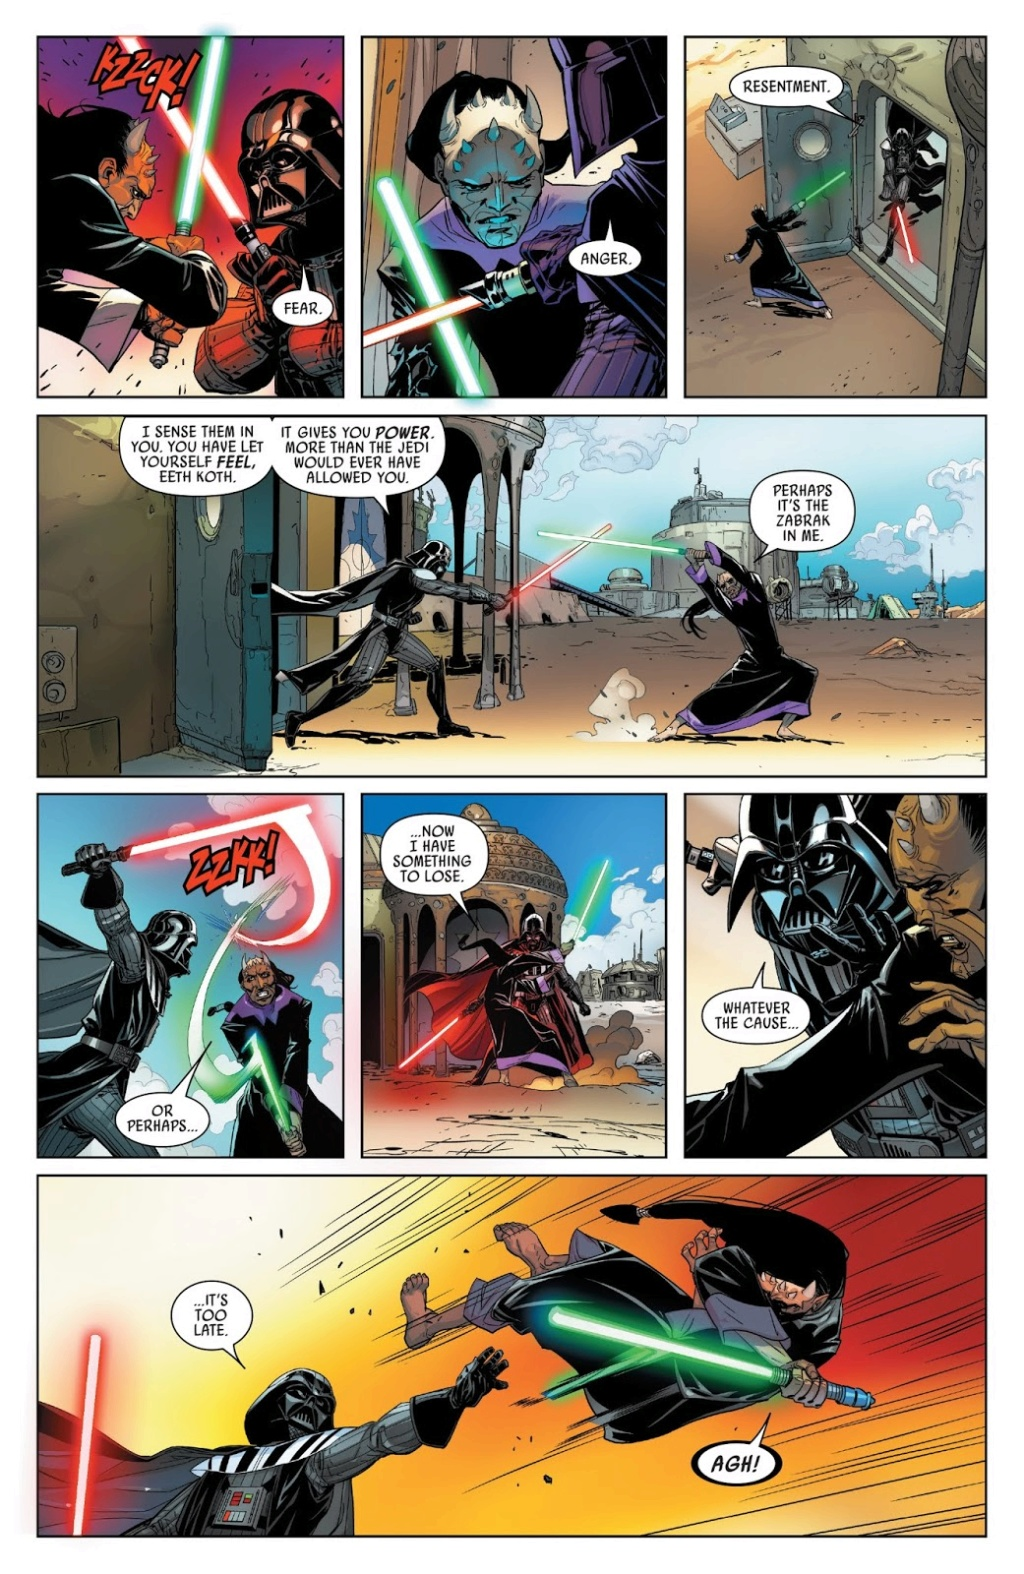 SS - Darth Maul (IG) vs. Darth Vader (BreakofDawn) Rco00812